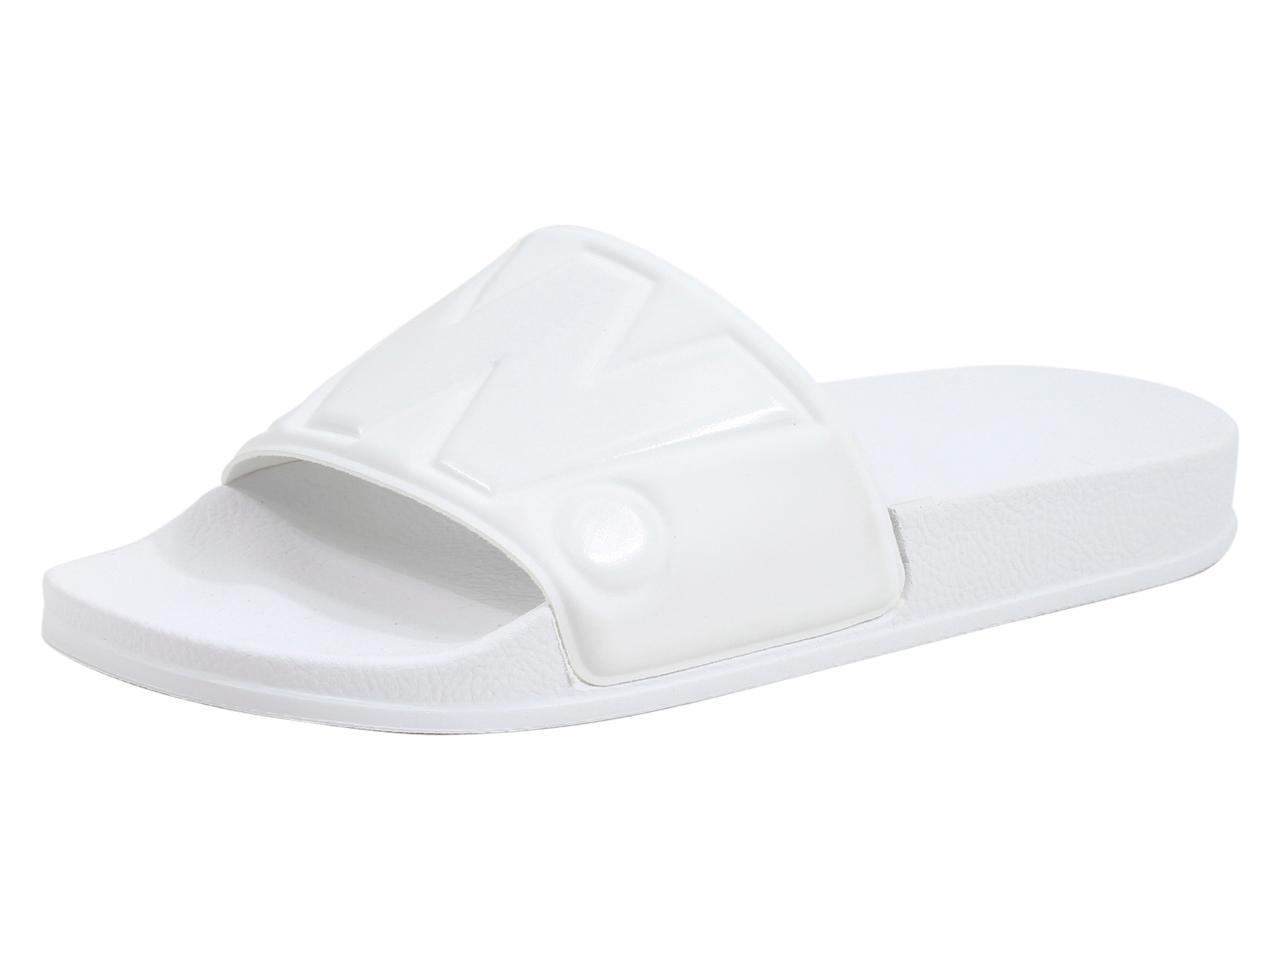 Image of G Star Raw Men's Cart Slide II Slides Sandals Shoes - White - 10 D(M) US